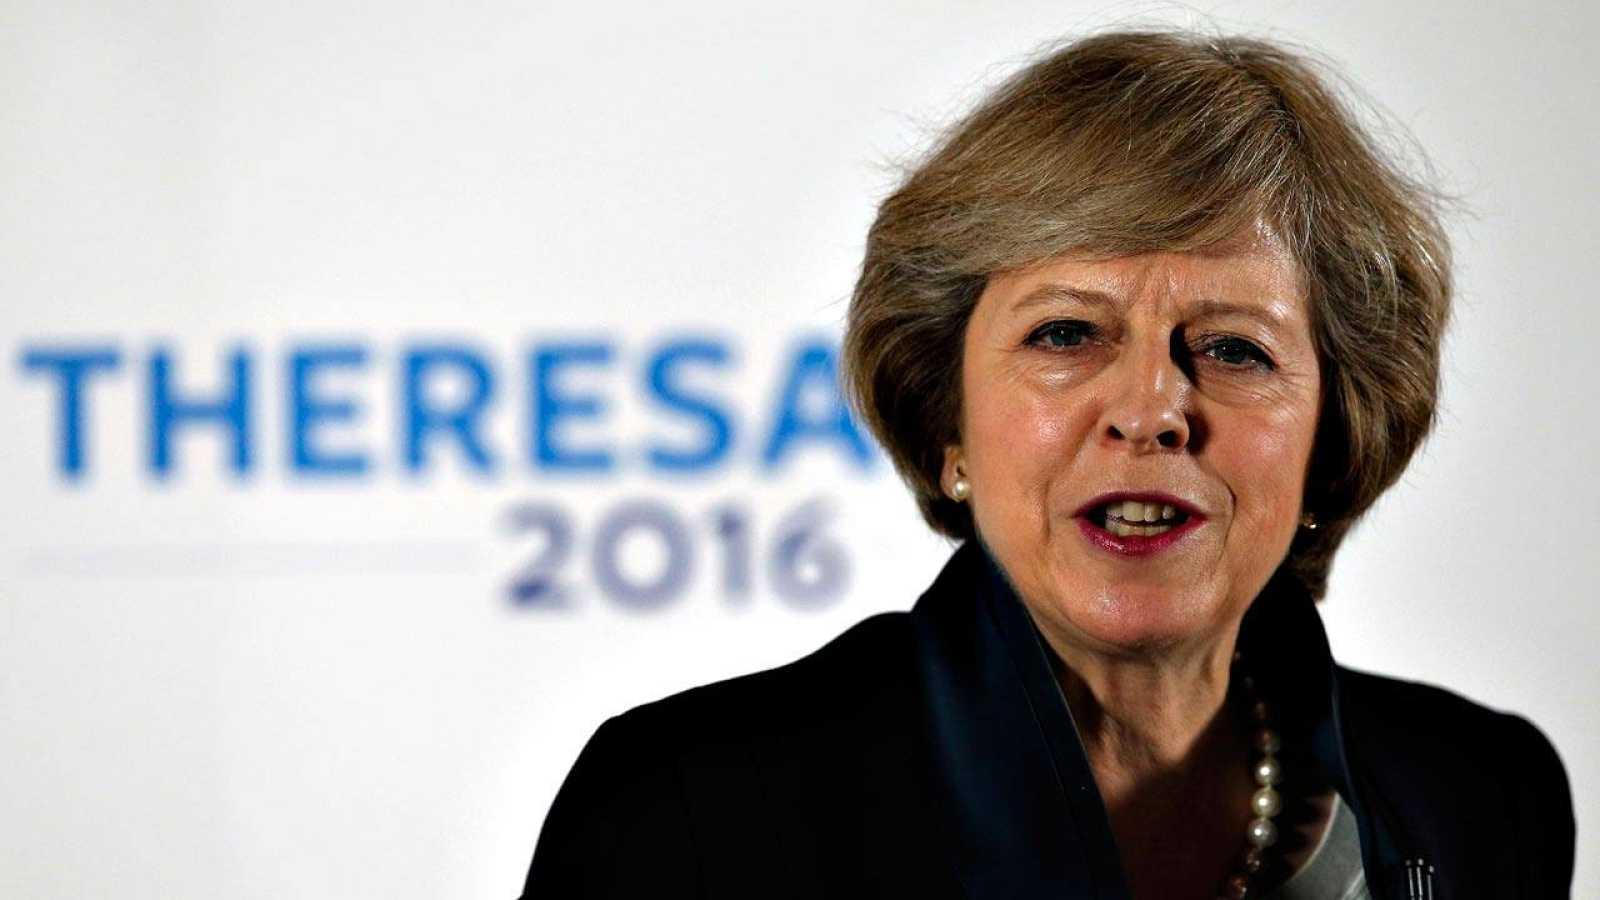 La nueva primera ministra de Reino Unido, Theresa May